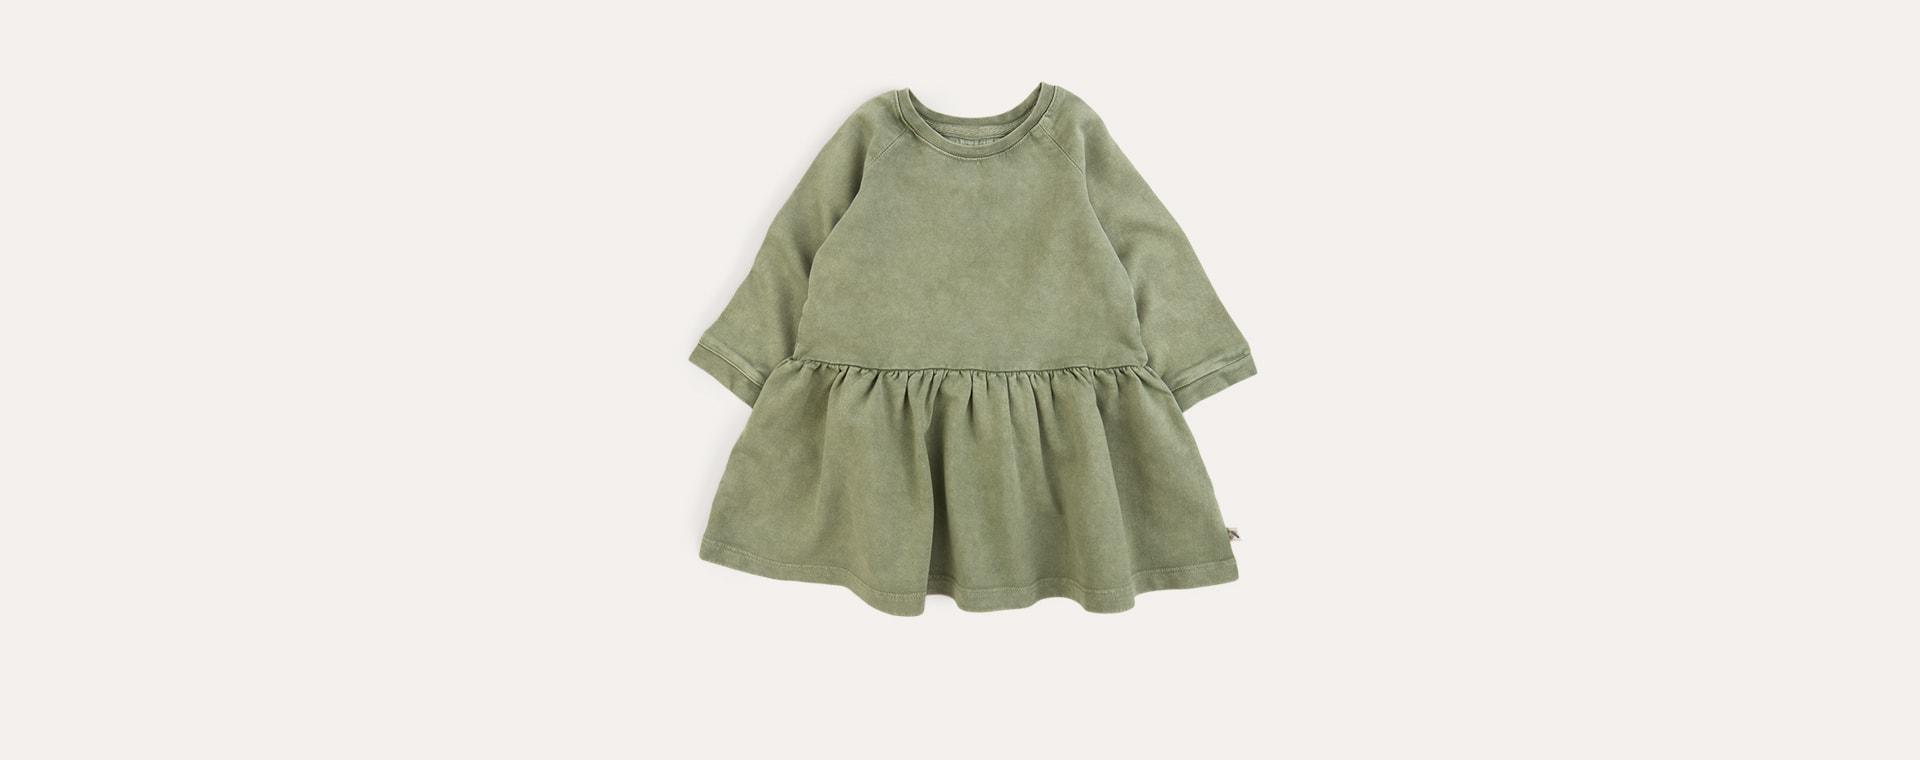 Moss KIDLY Label Washed Dress